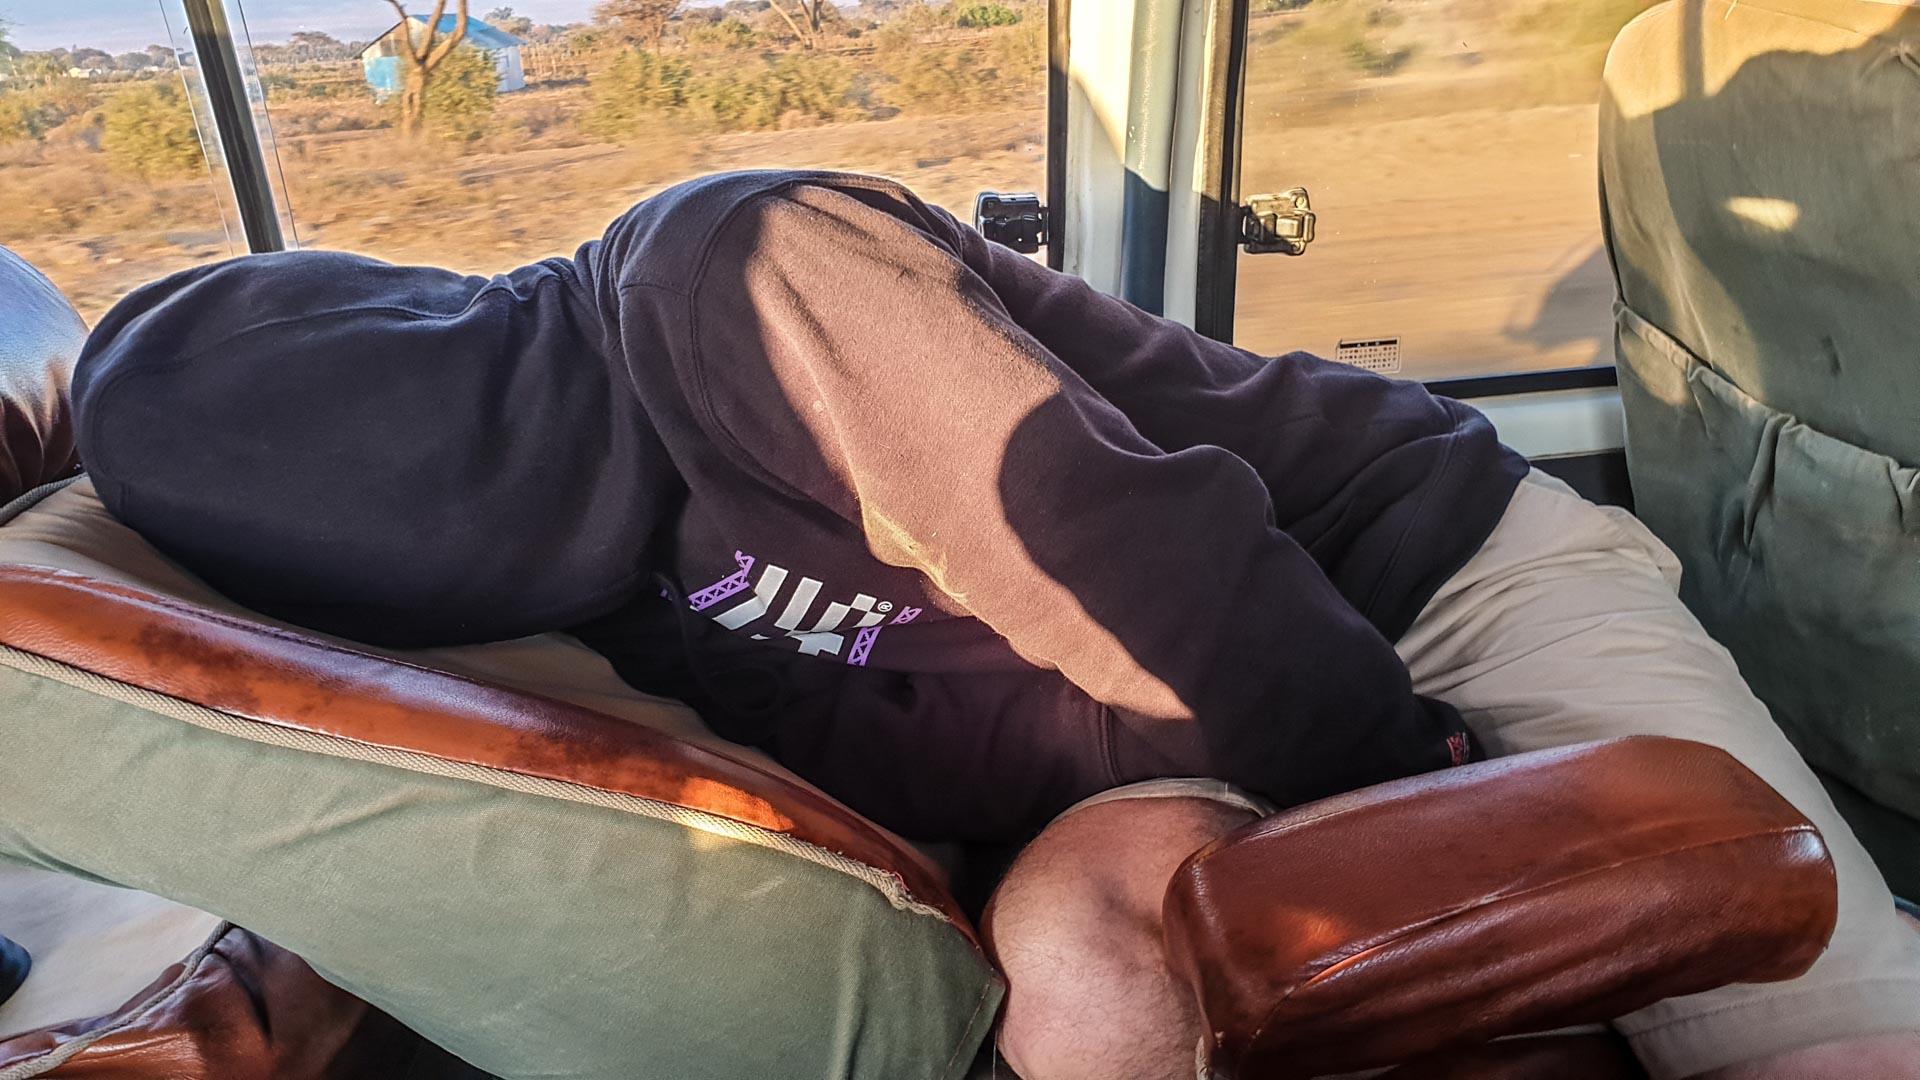 Beni haciendo de la niña del exorcista en el trayecto de Amboseli a Lago Nakuru